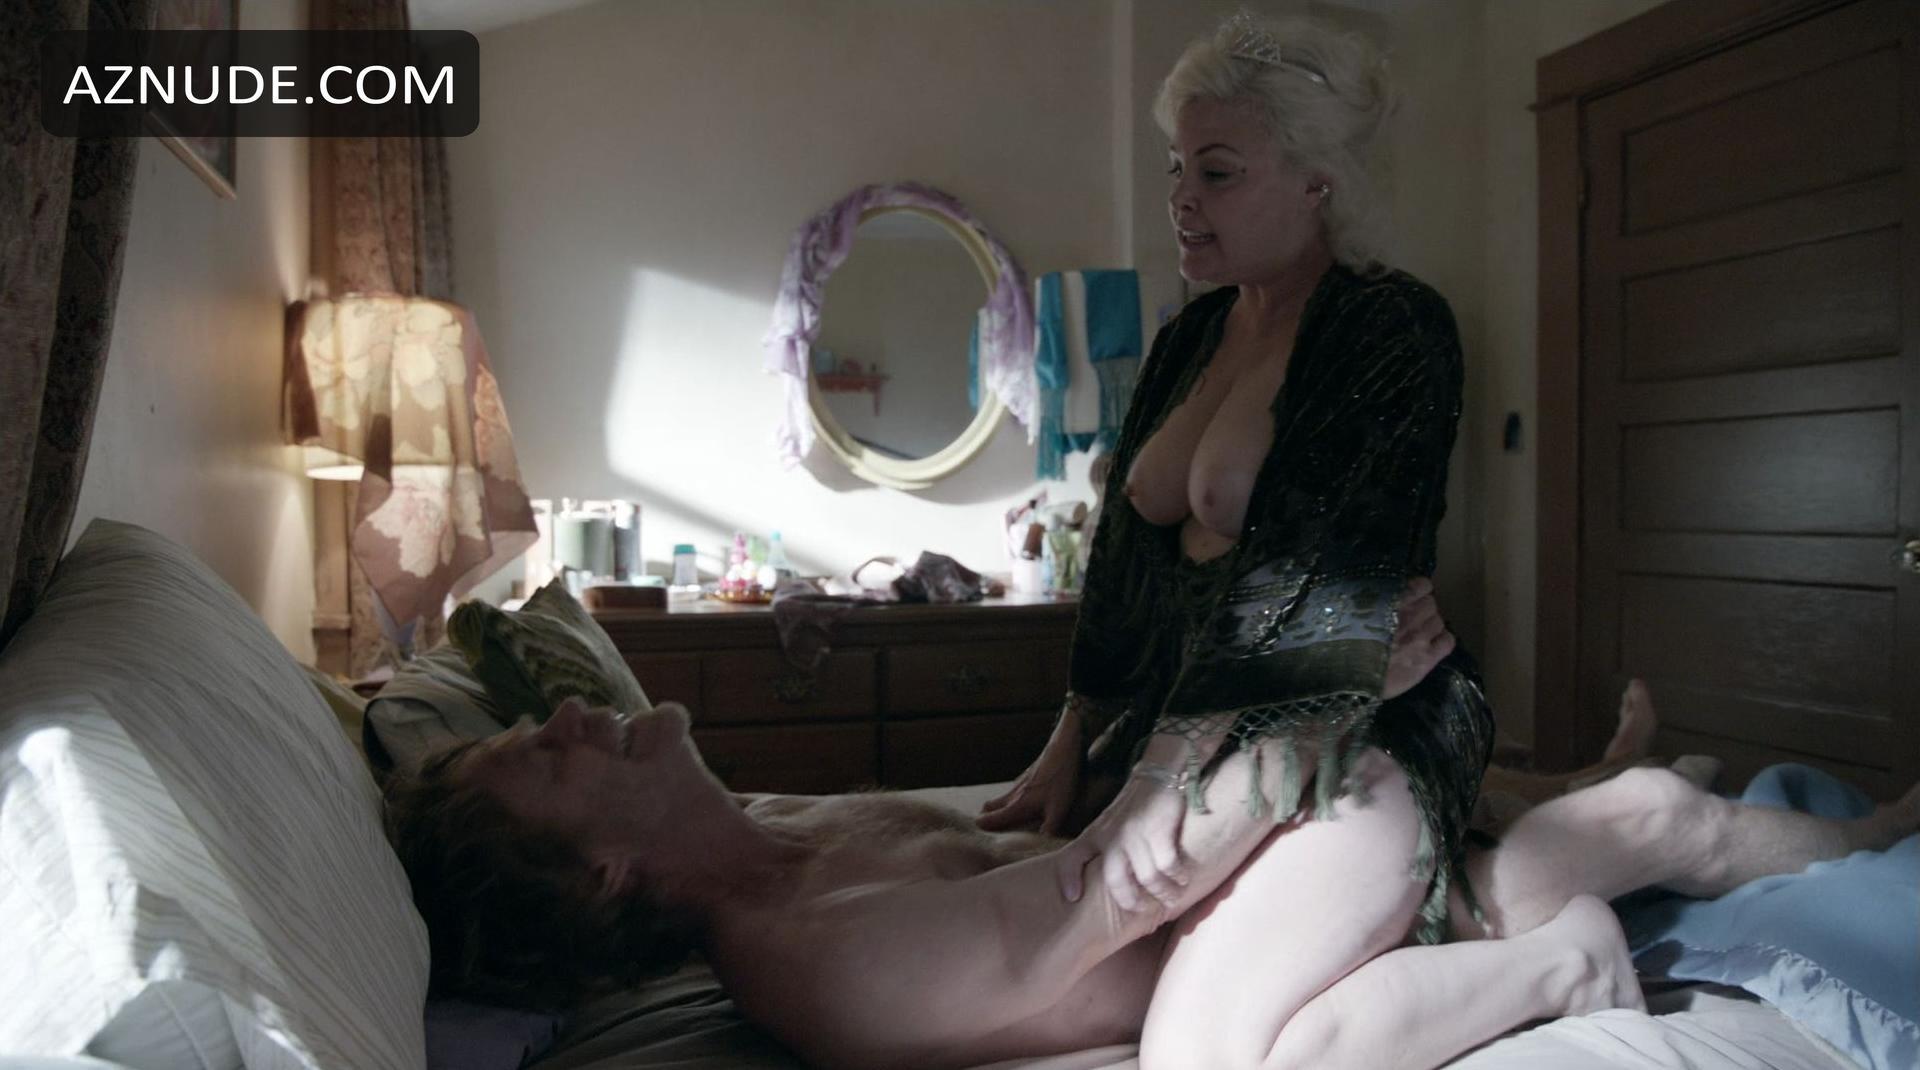 Maria breese and jocelin albor nude group sex scene in shame - 2 part 9